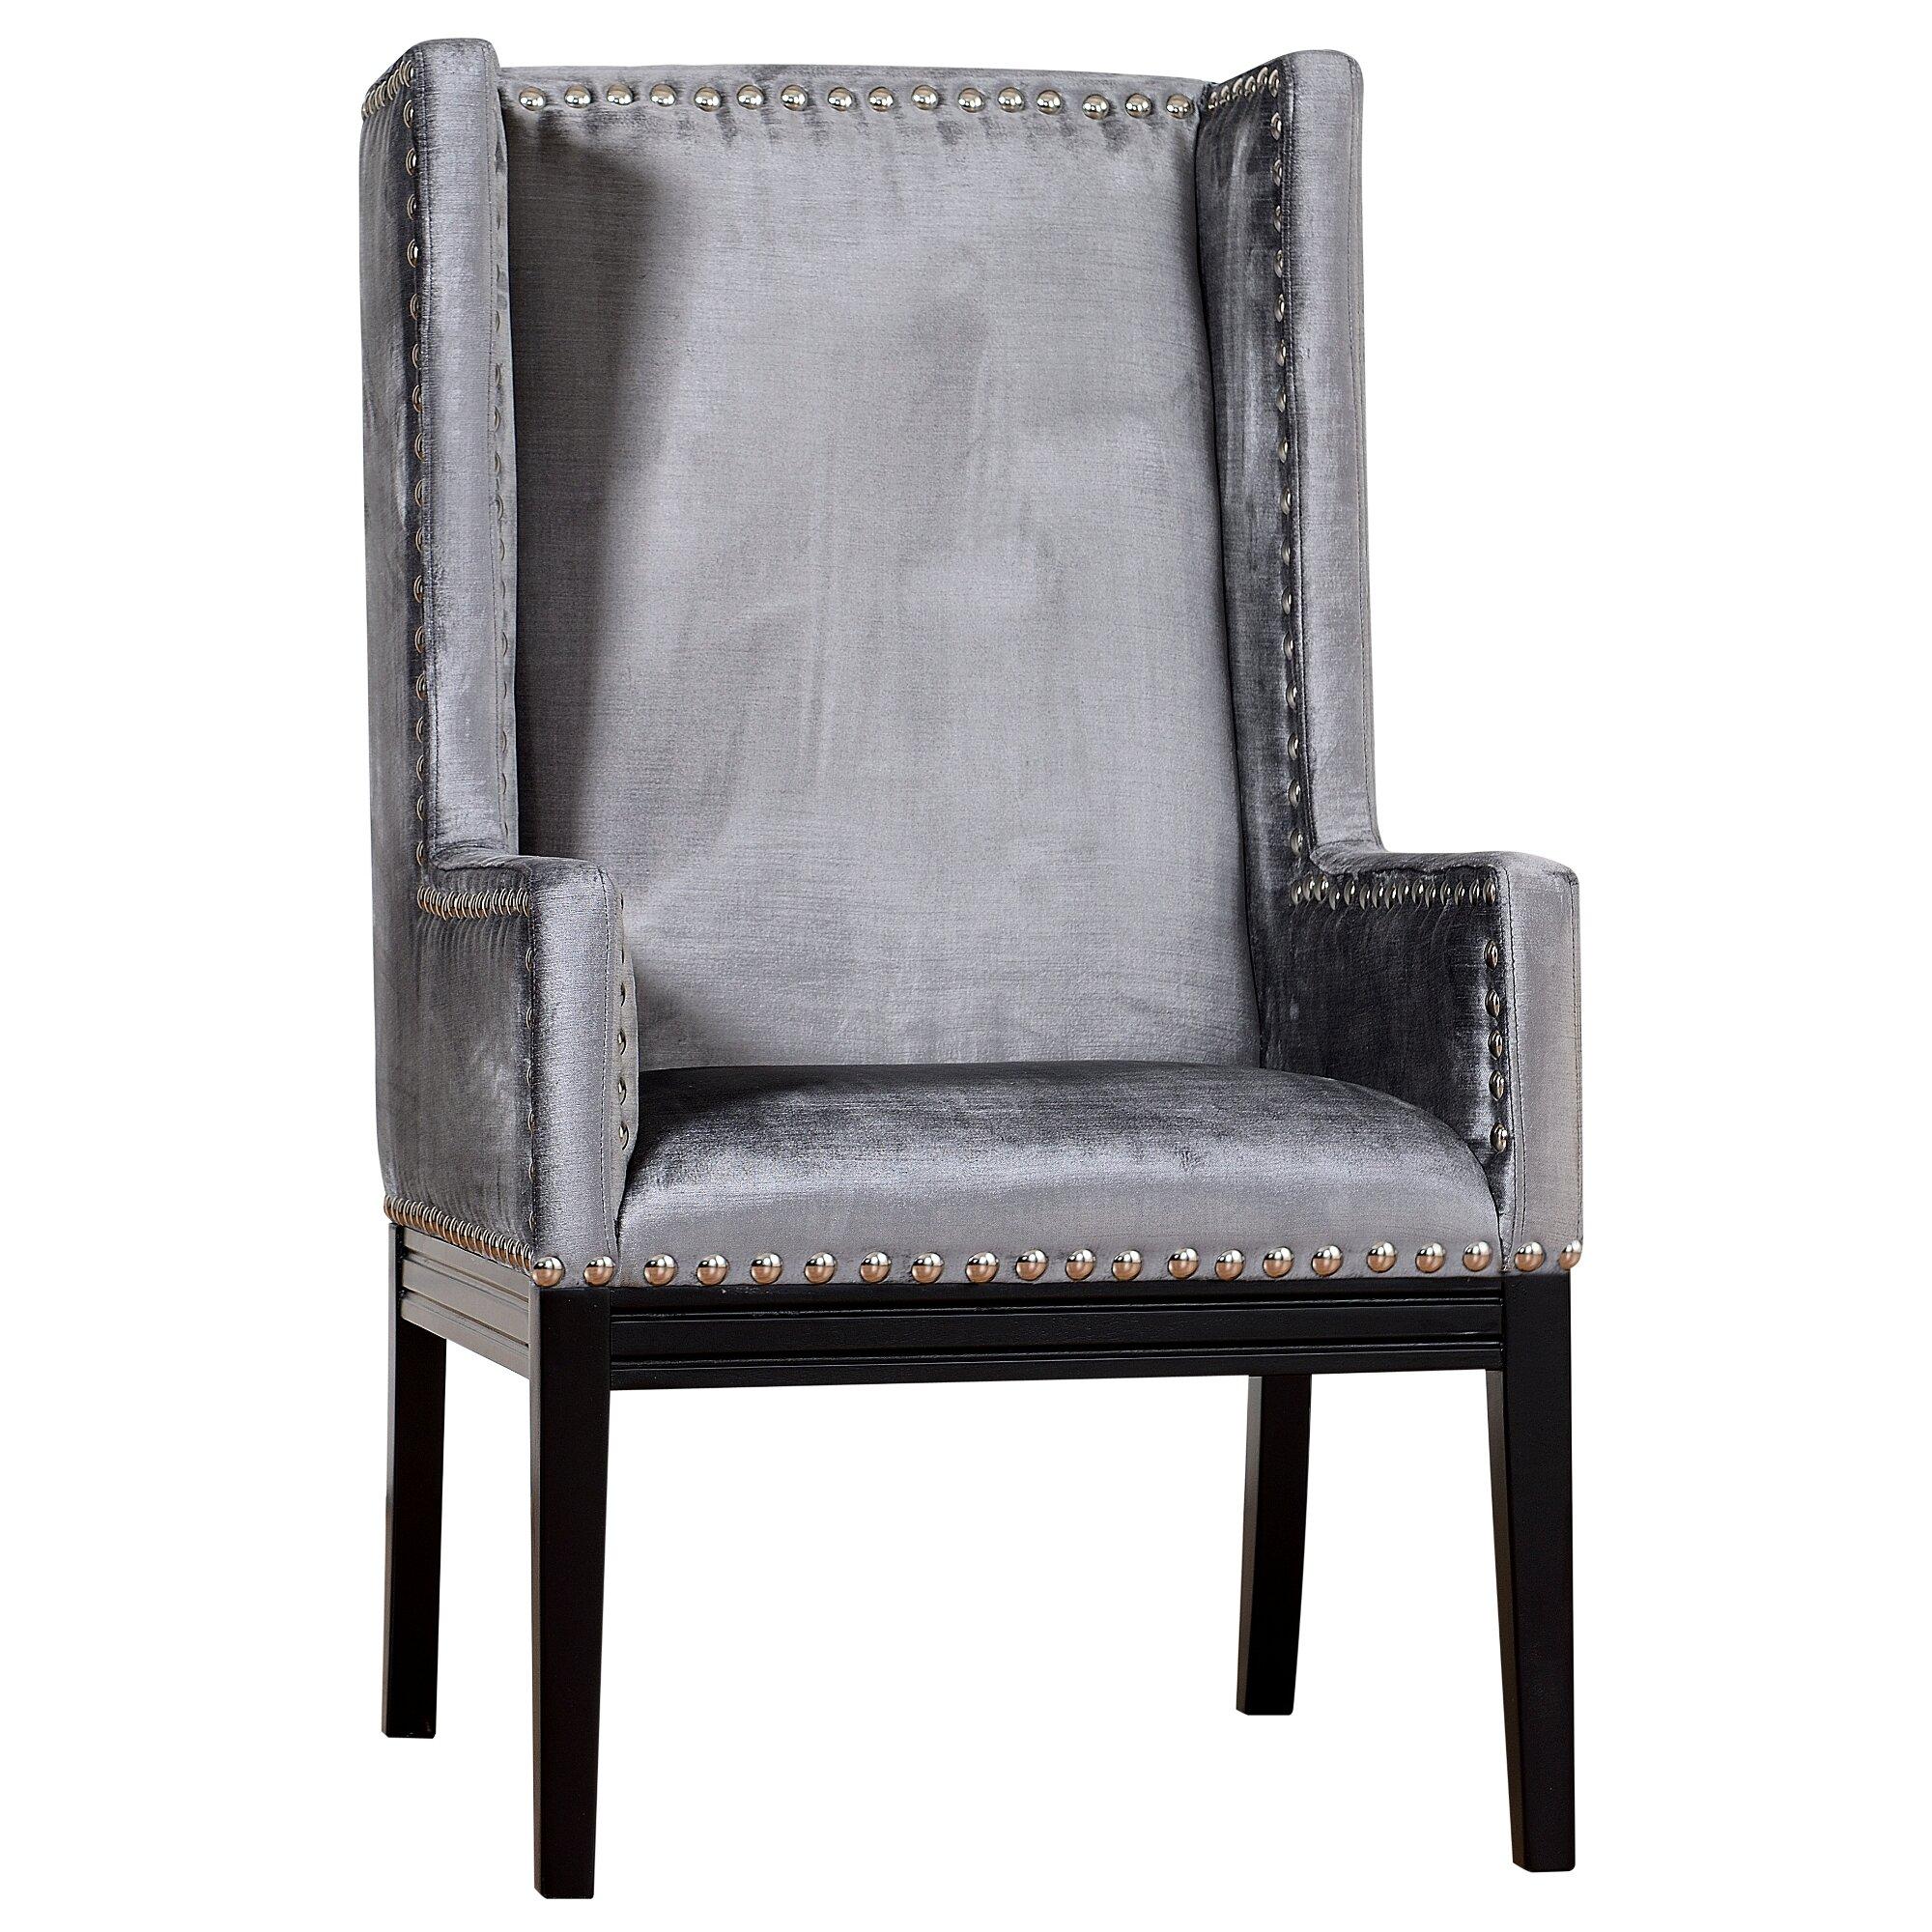 Mazel Tov Furniture